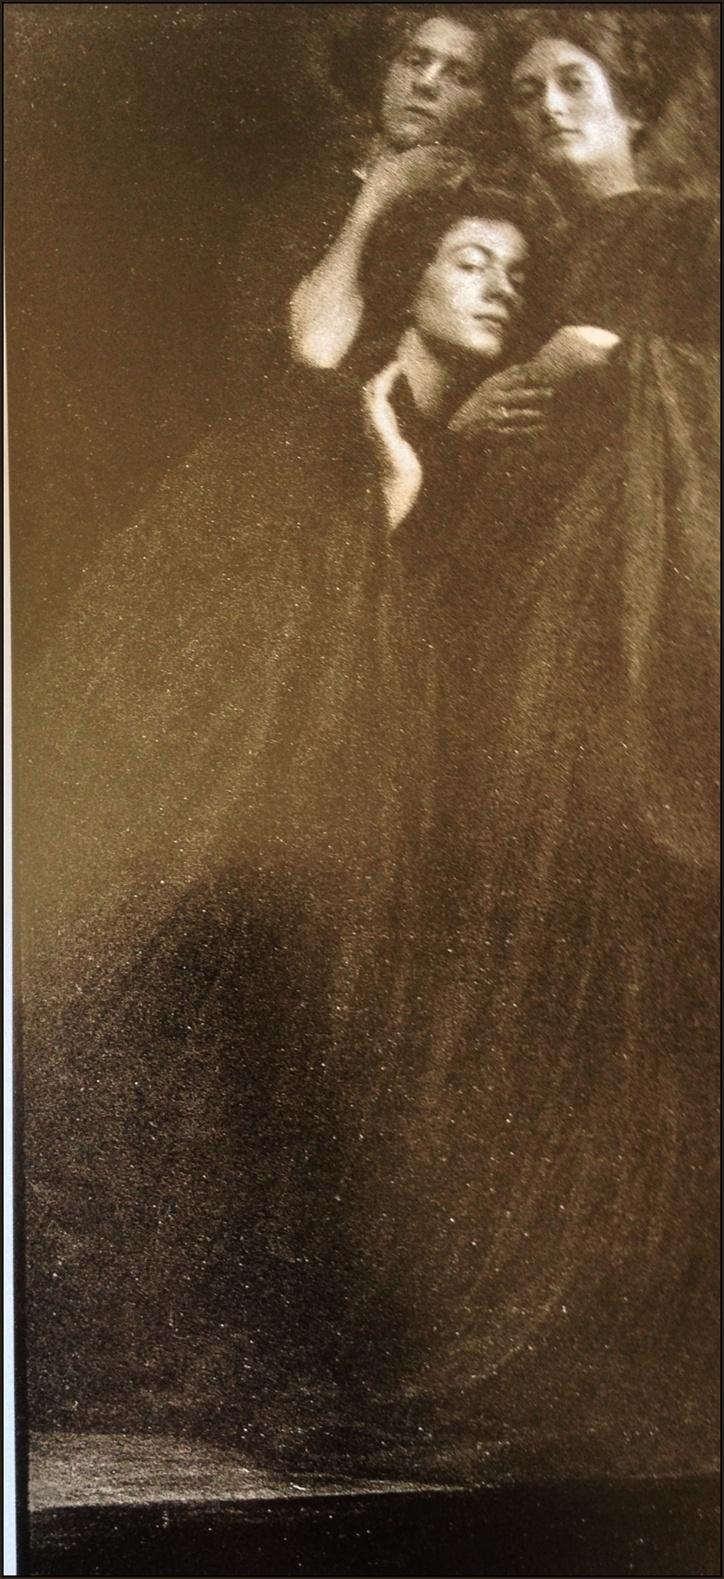 Anton Josef Trčka - Composition with three women in black robes, 1913